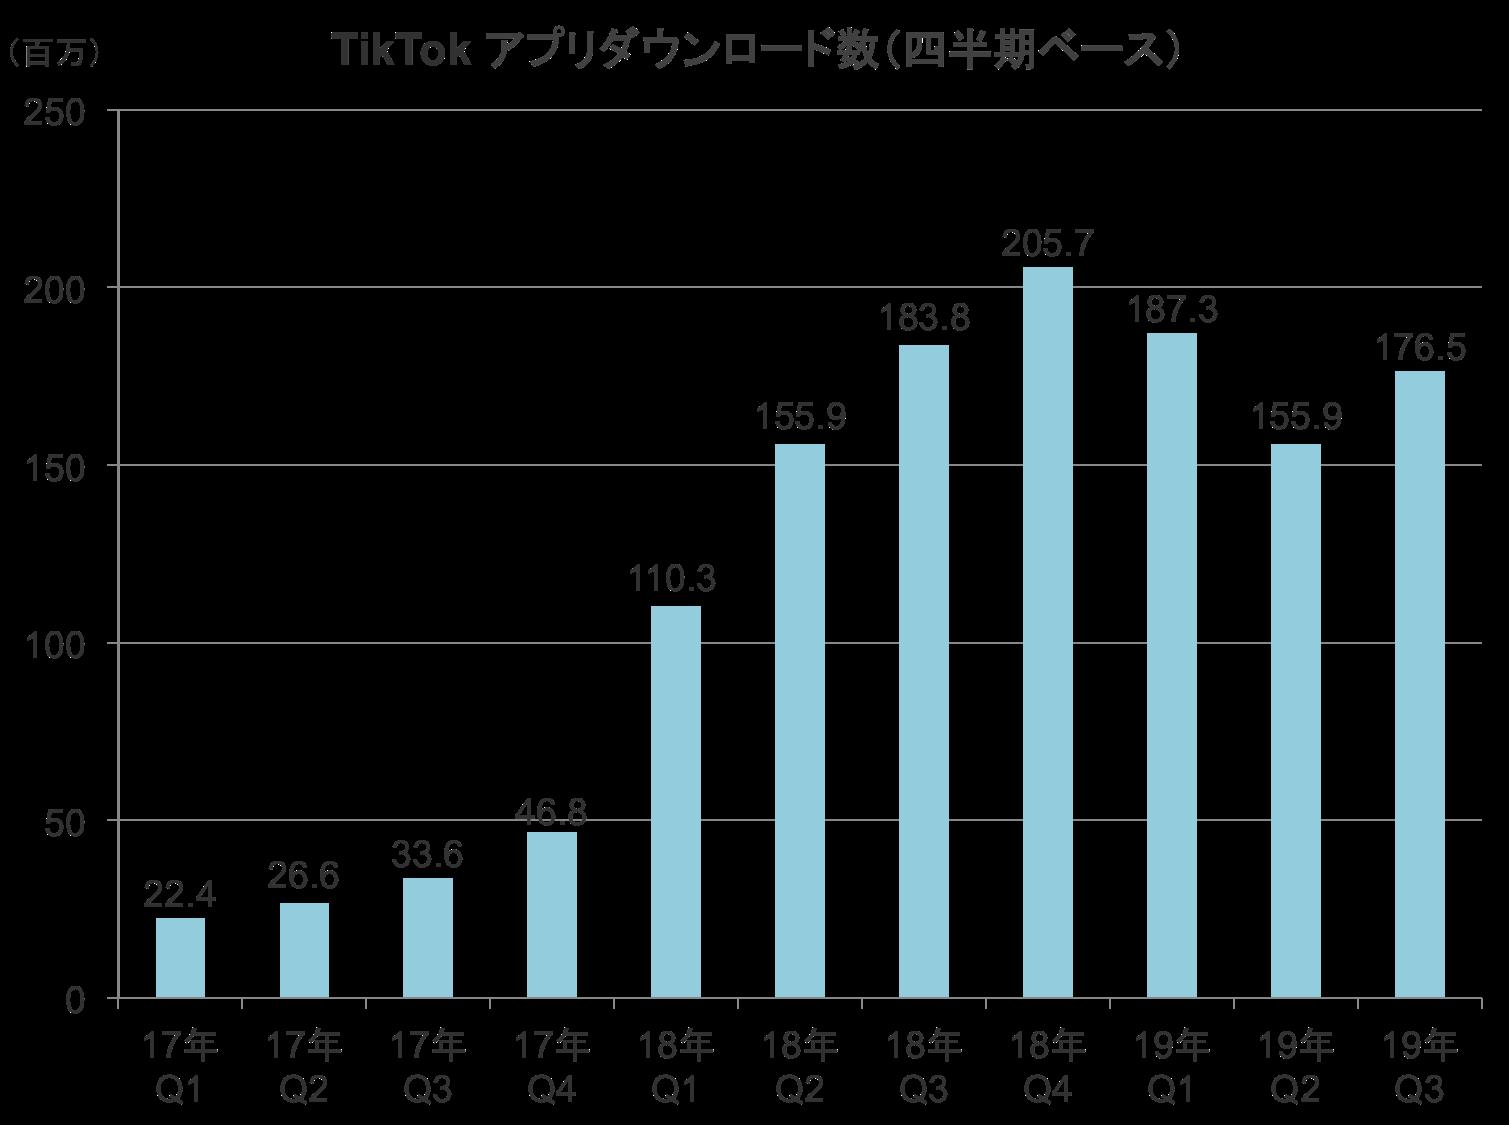 TikTokアプリのダウンロード数の四半期ベース推移